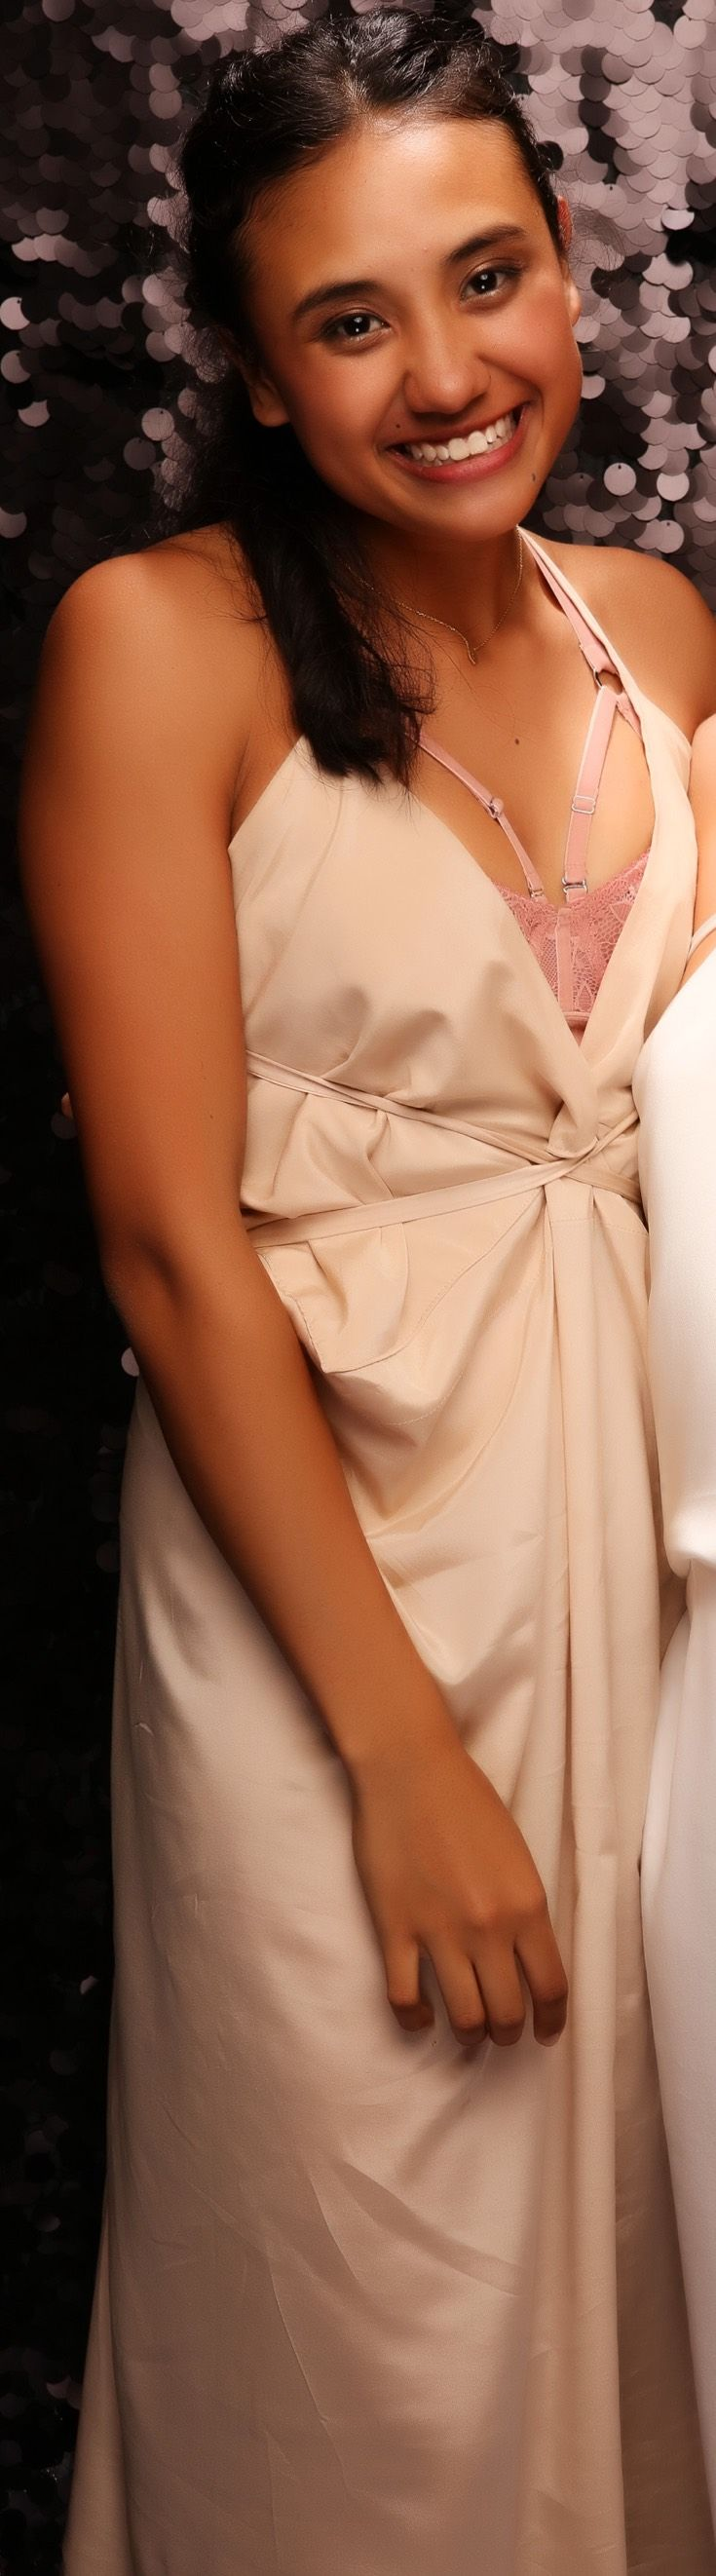 St Peter's Ball 2015. Adore this feminine look! www.whitedoor.co.nz